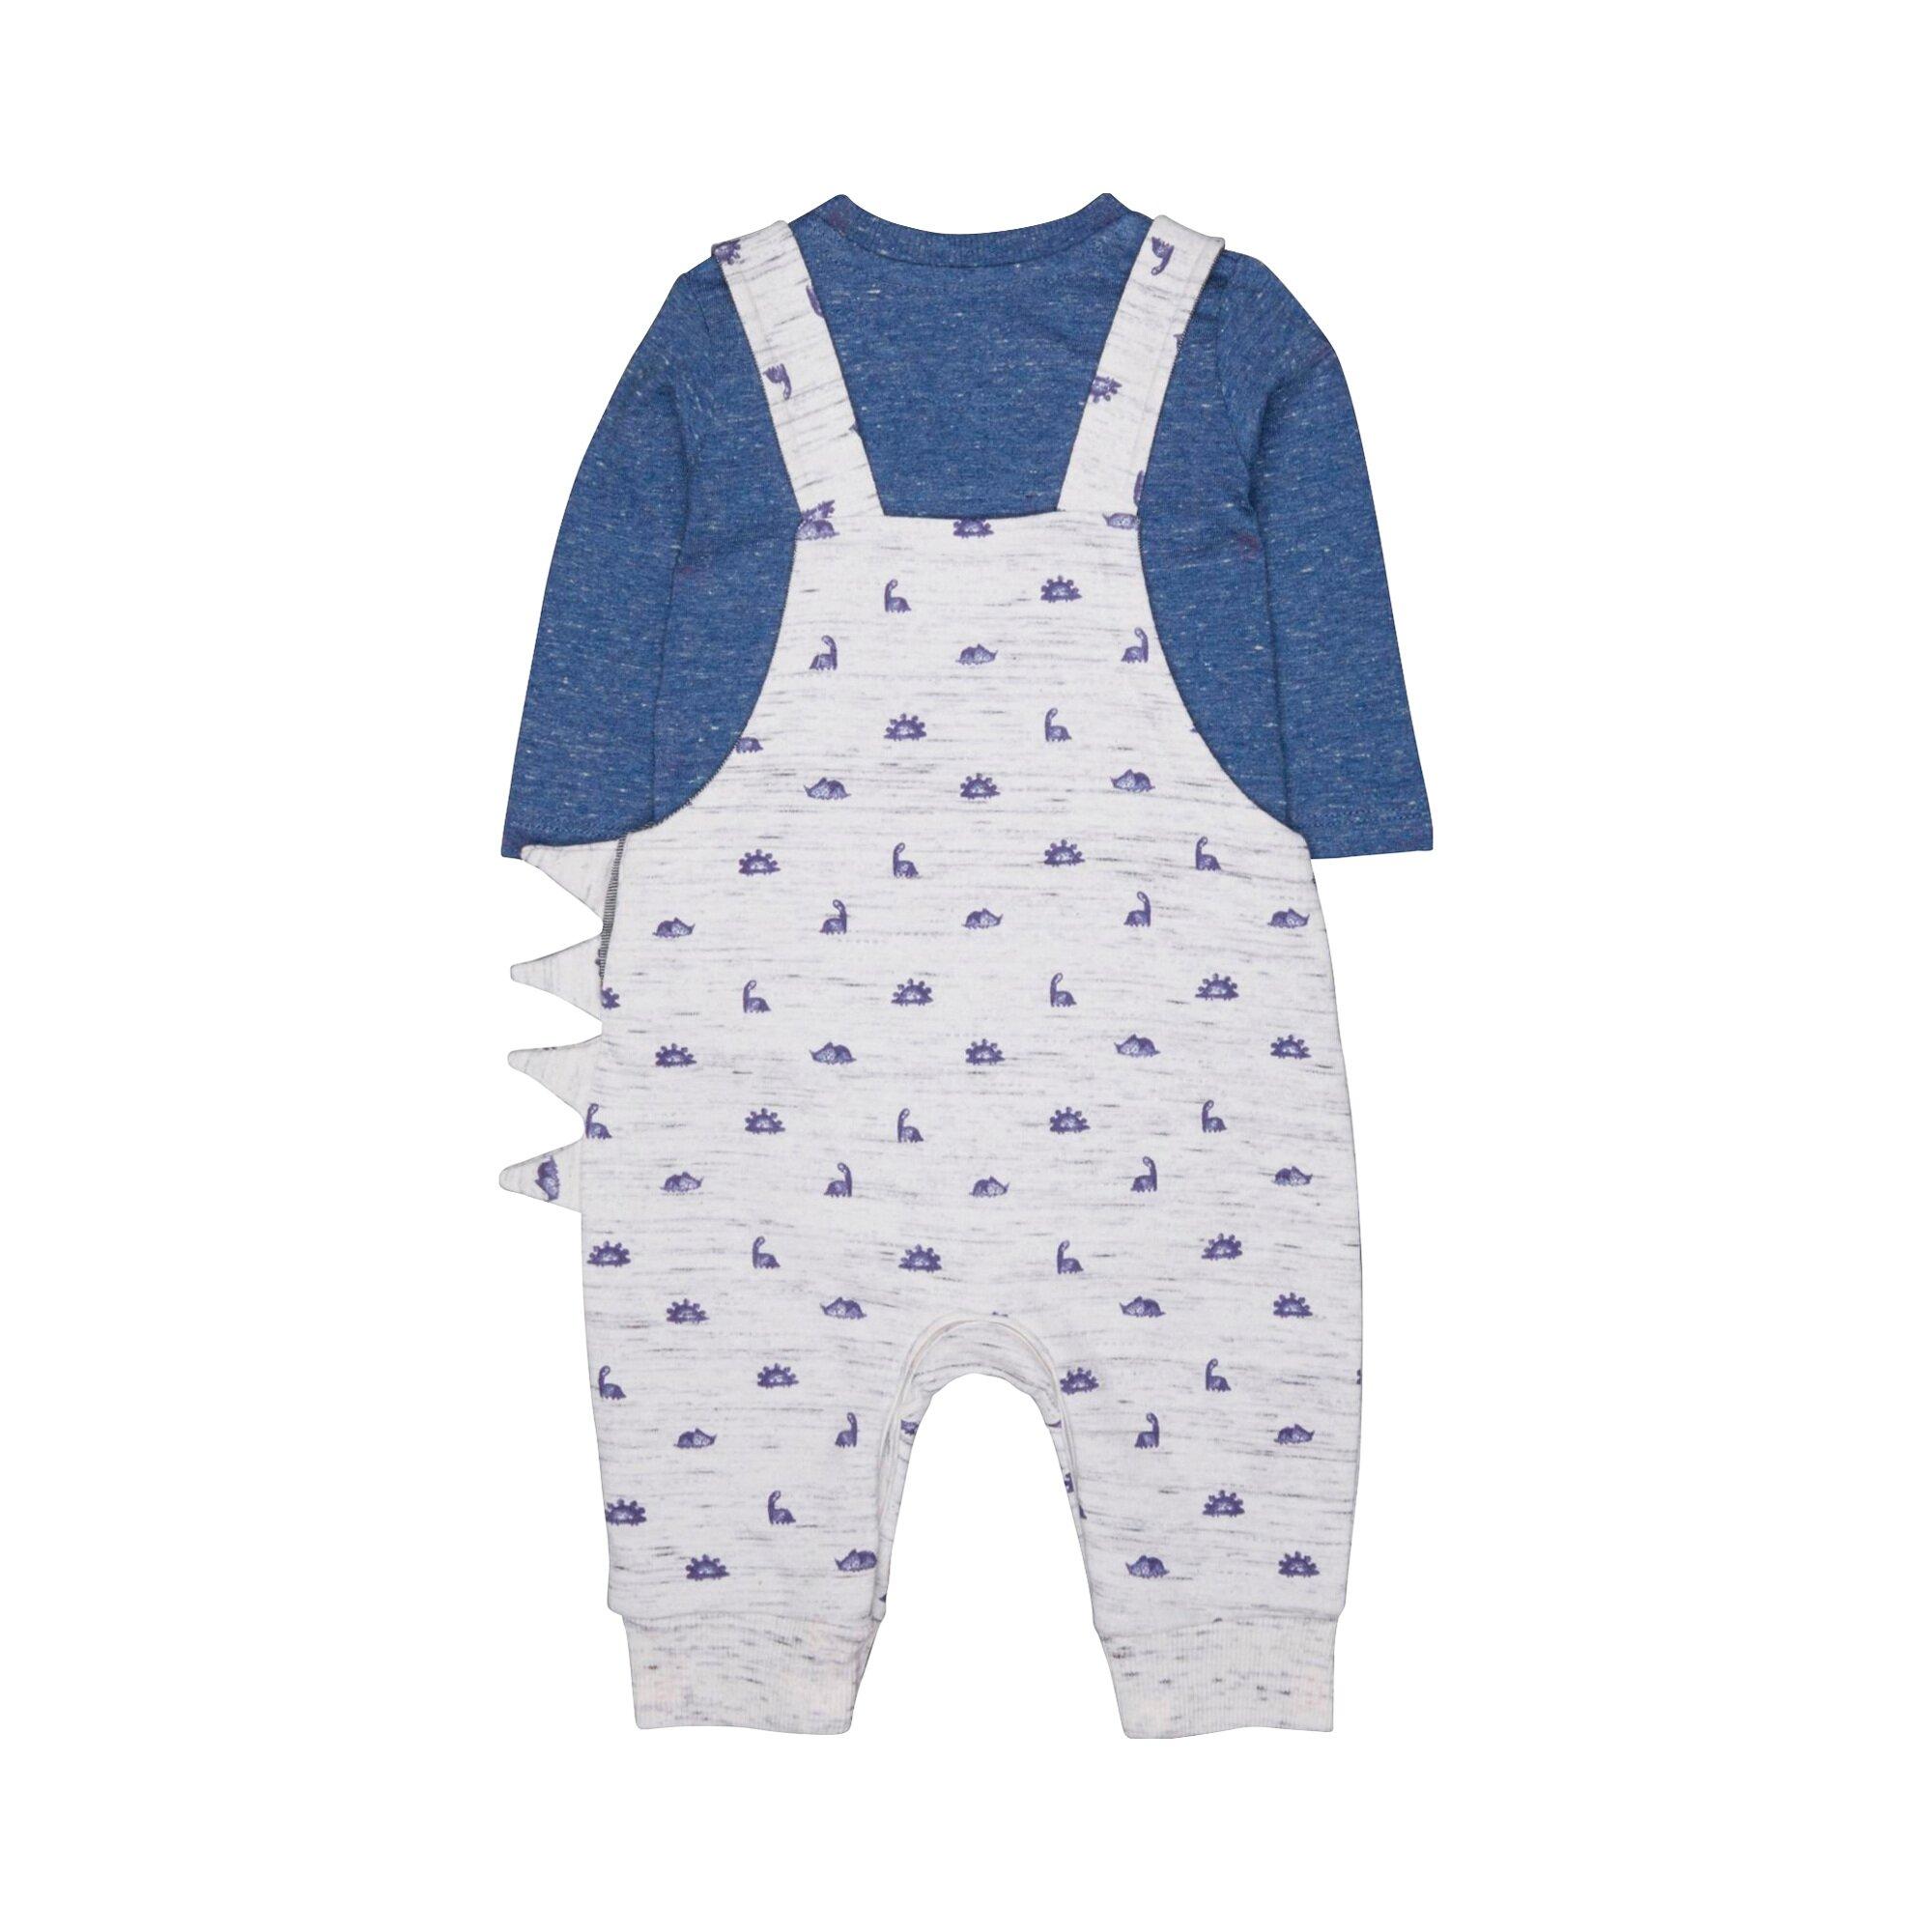 mothercare-2-tlg-set-sweat-latzhose-und-shirt-langarm-dinos